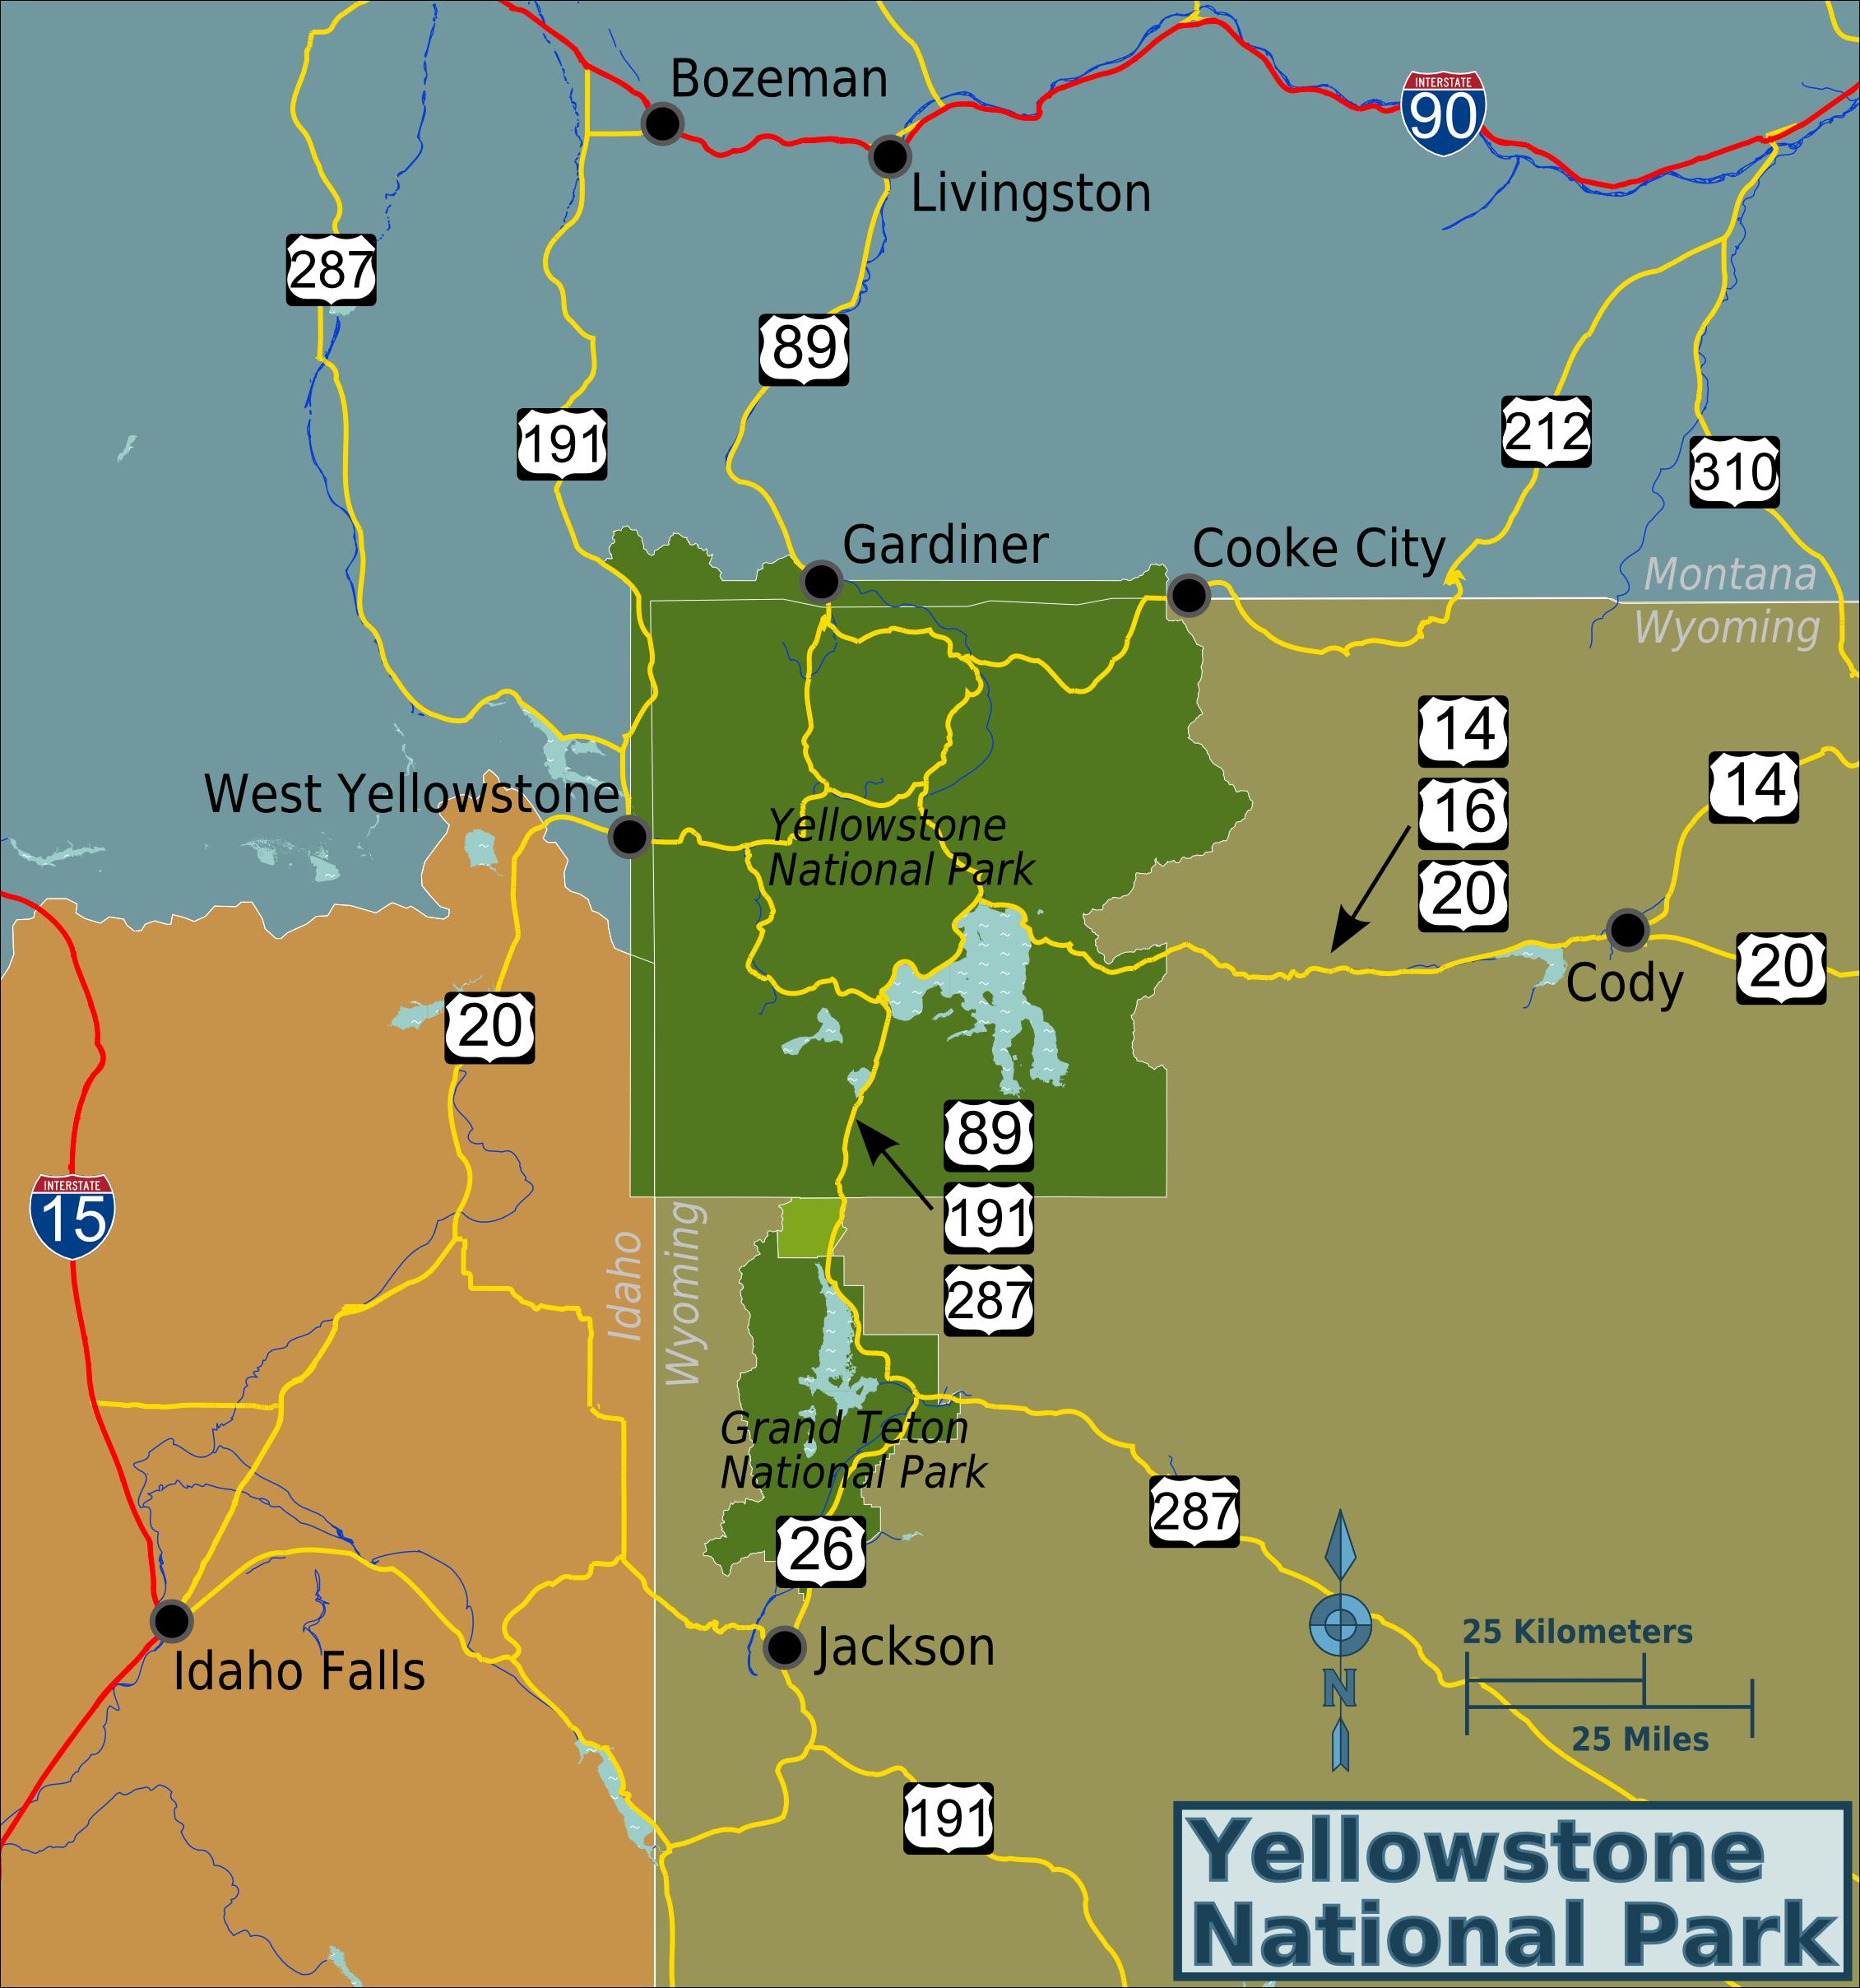 File:Yellowstone-area-map.png - Wikimedia Commons